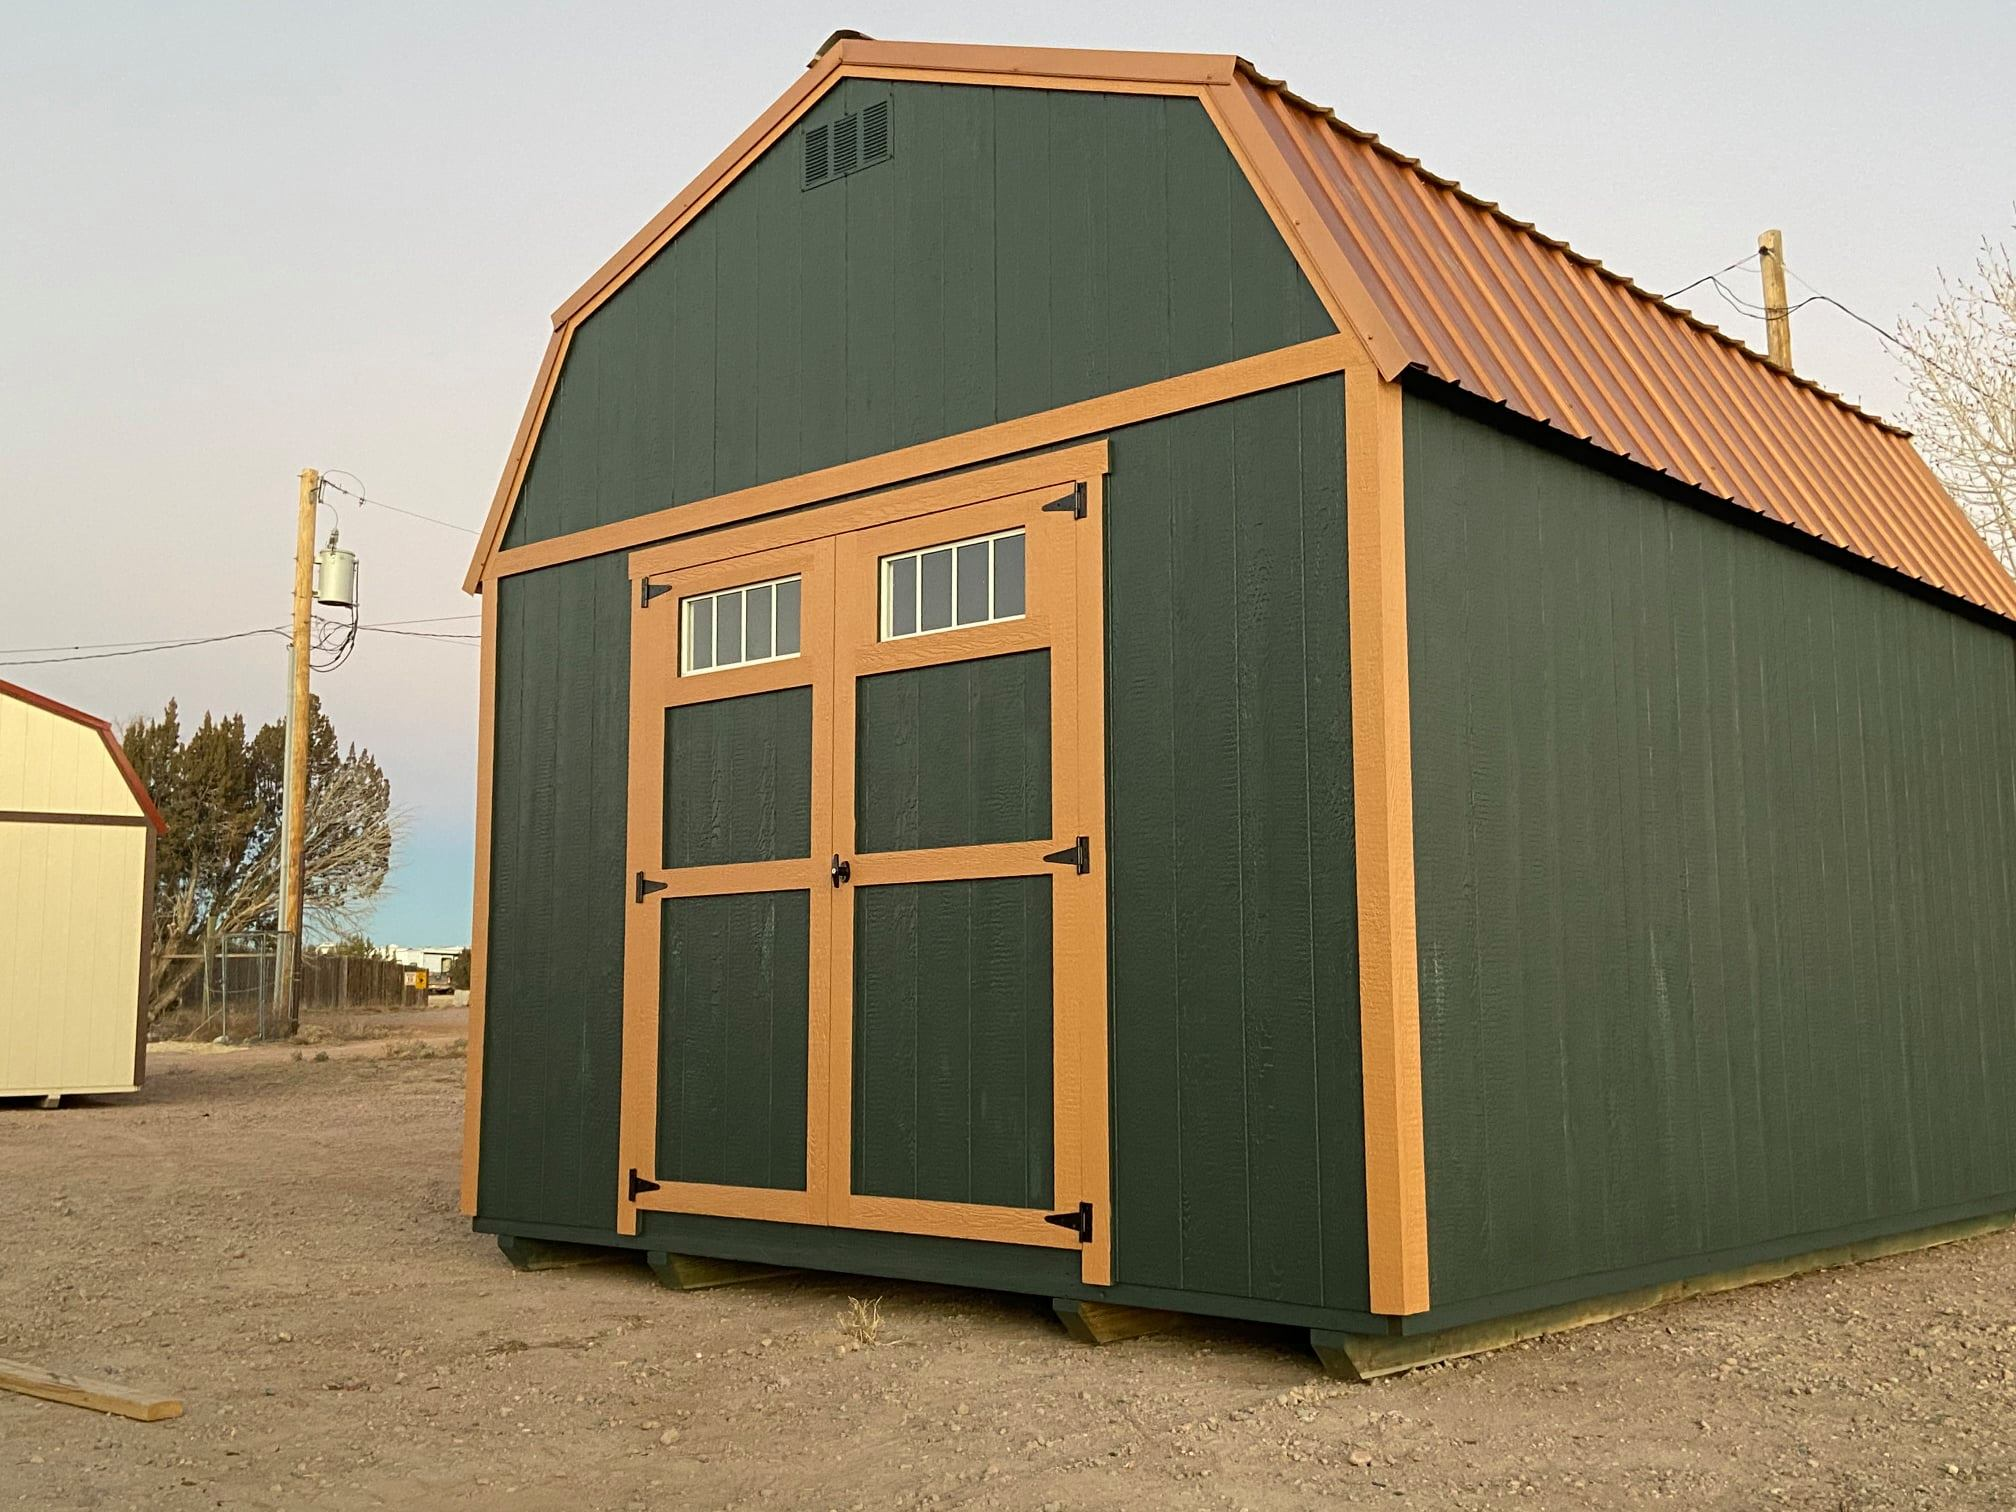 Yoder's Storage Sheds | Shed Foundation | Lofted Barn